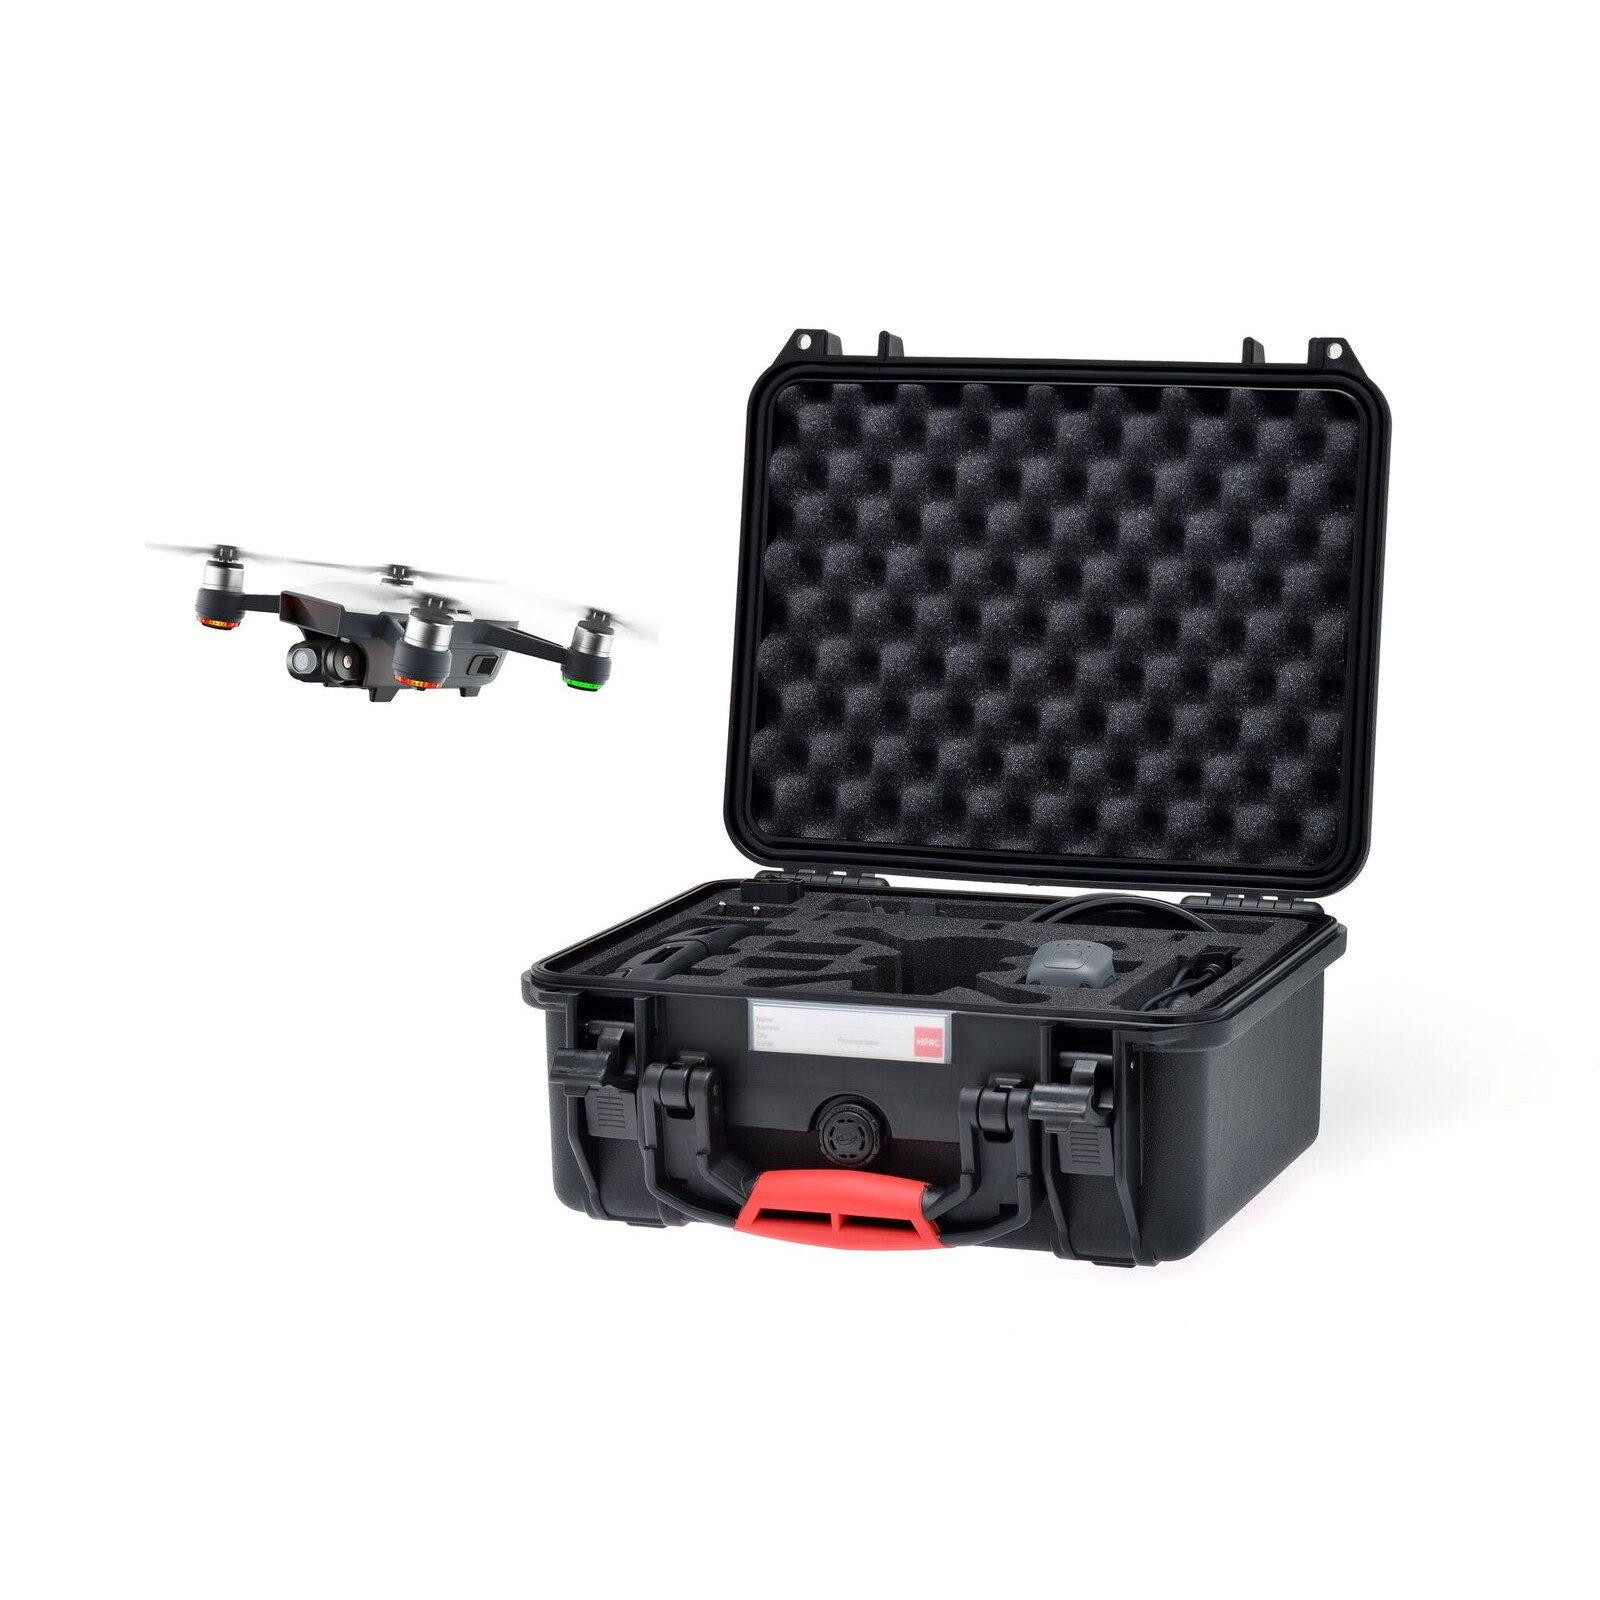 HPRC 2300 koffer voor DJI Spark Zwart